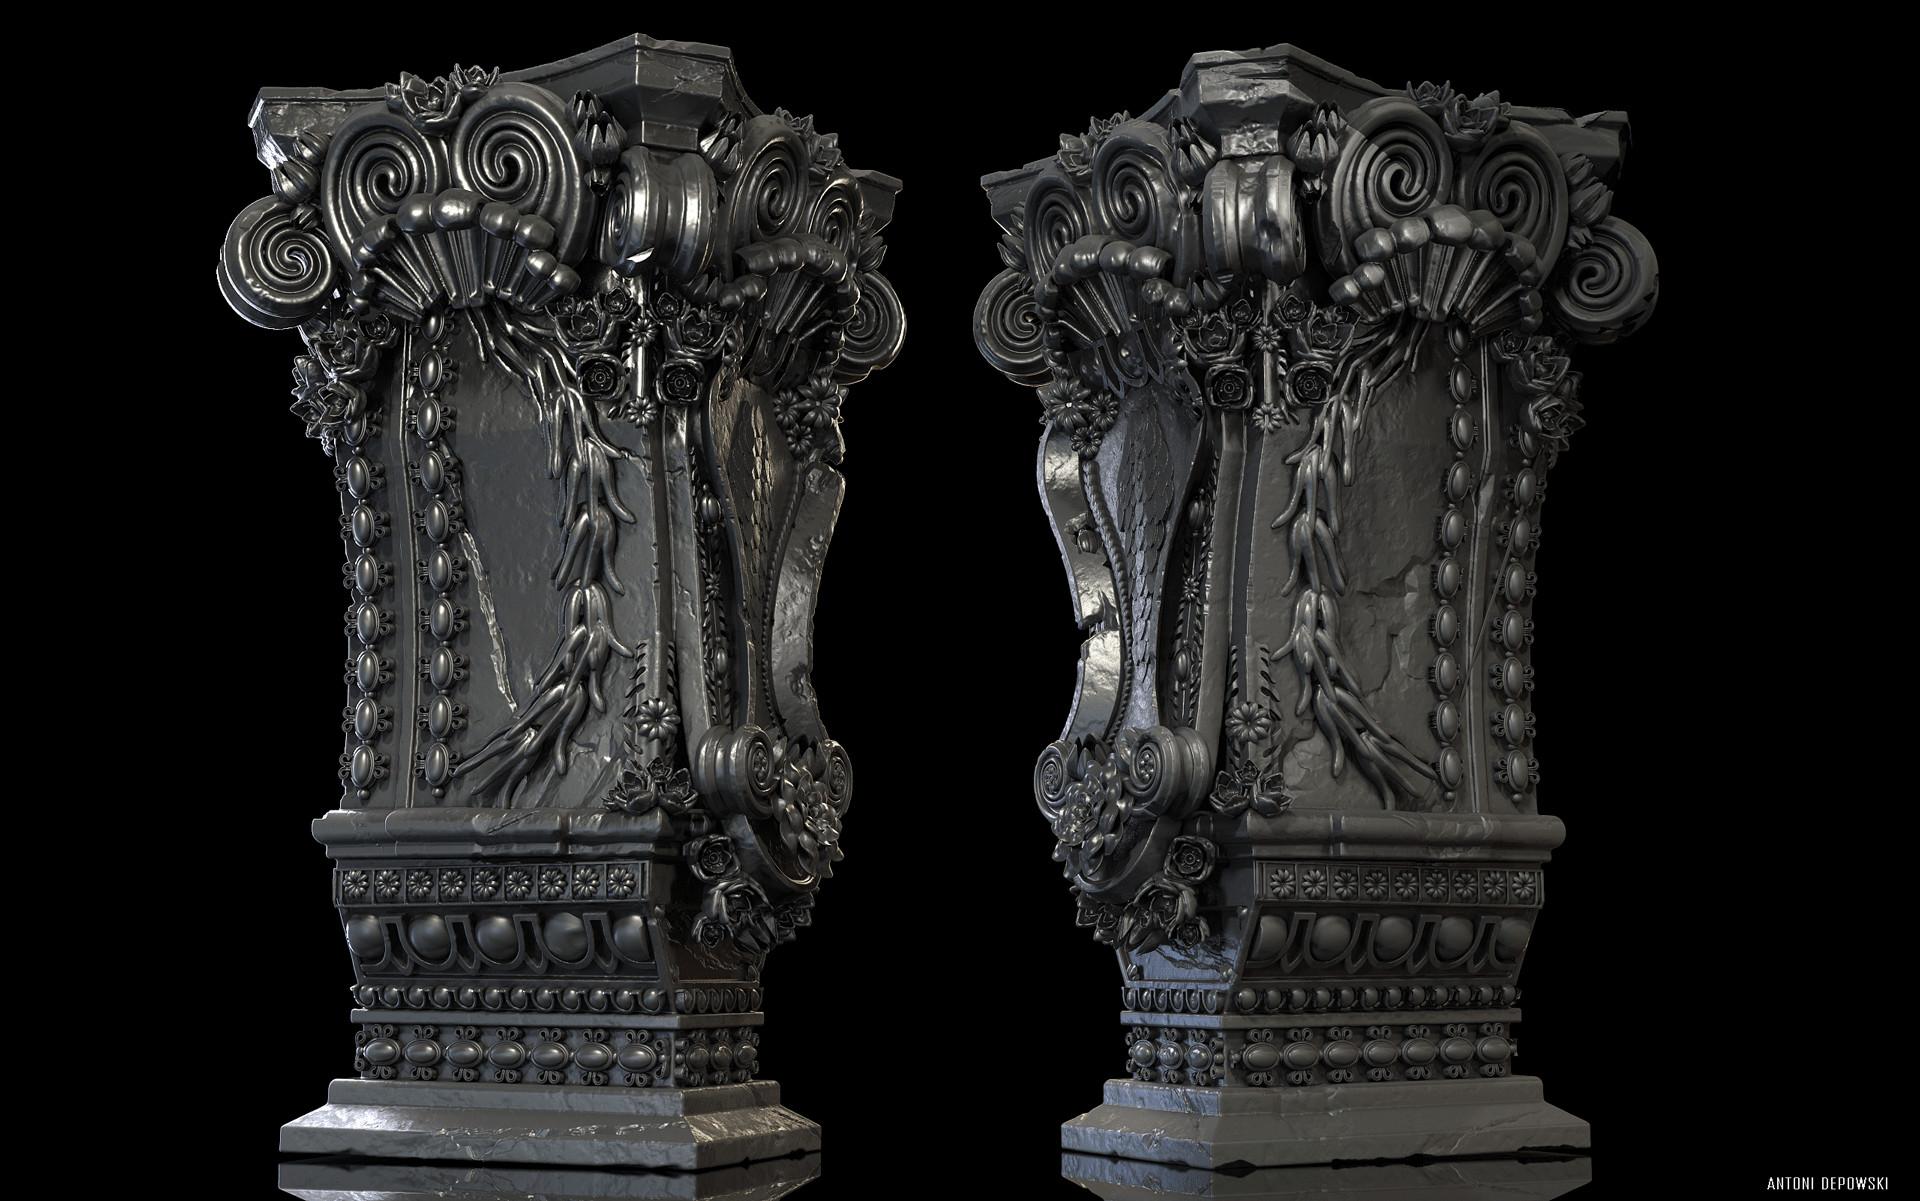 Antoni depowski baroque pedestal 3